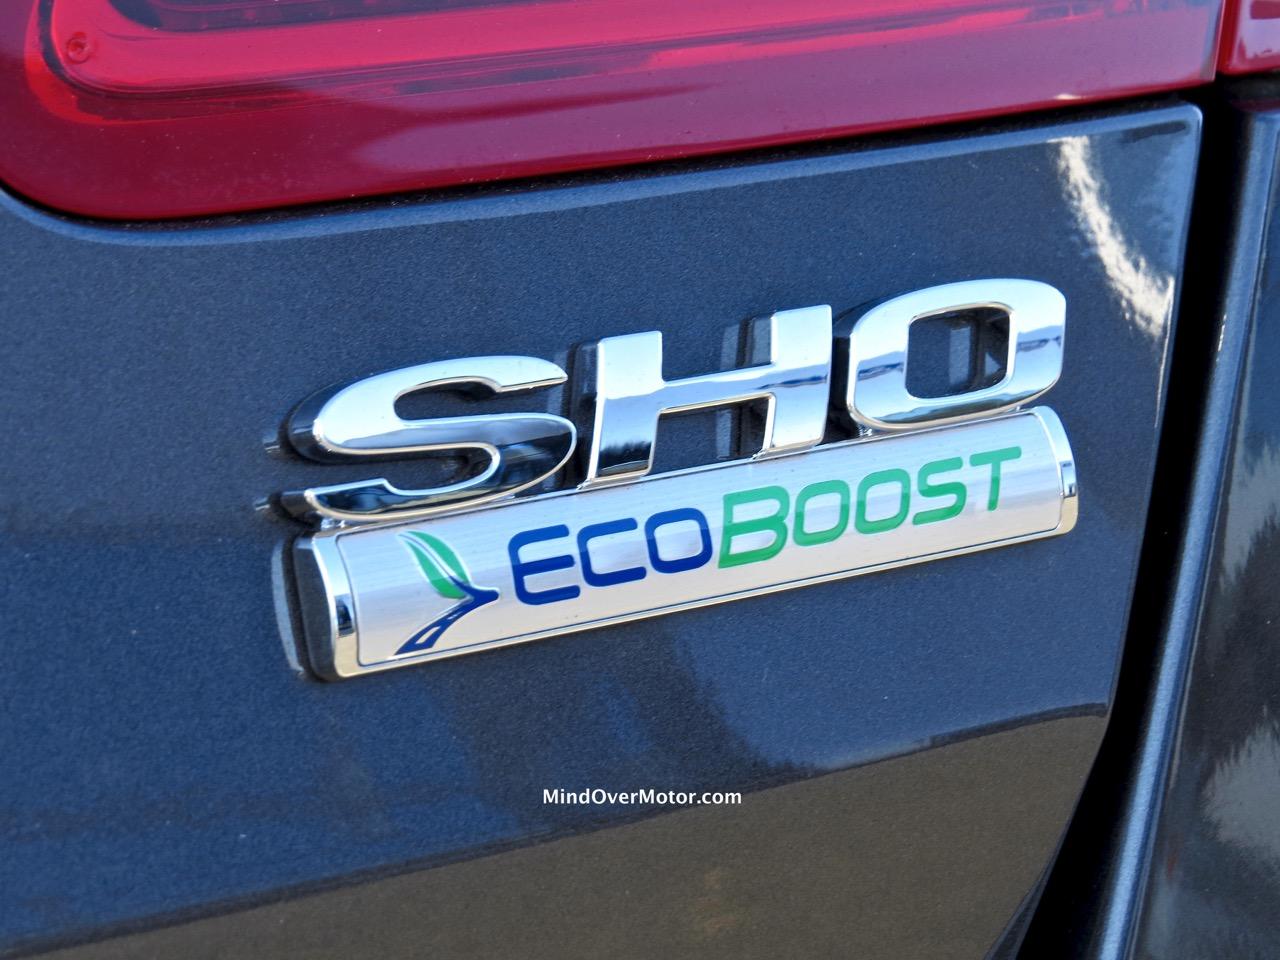 2015 Ford Taurus SHO Badge